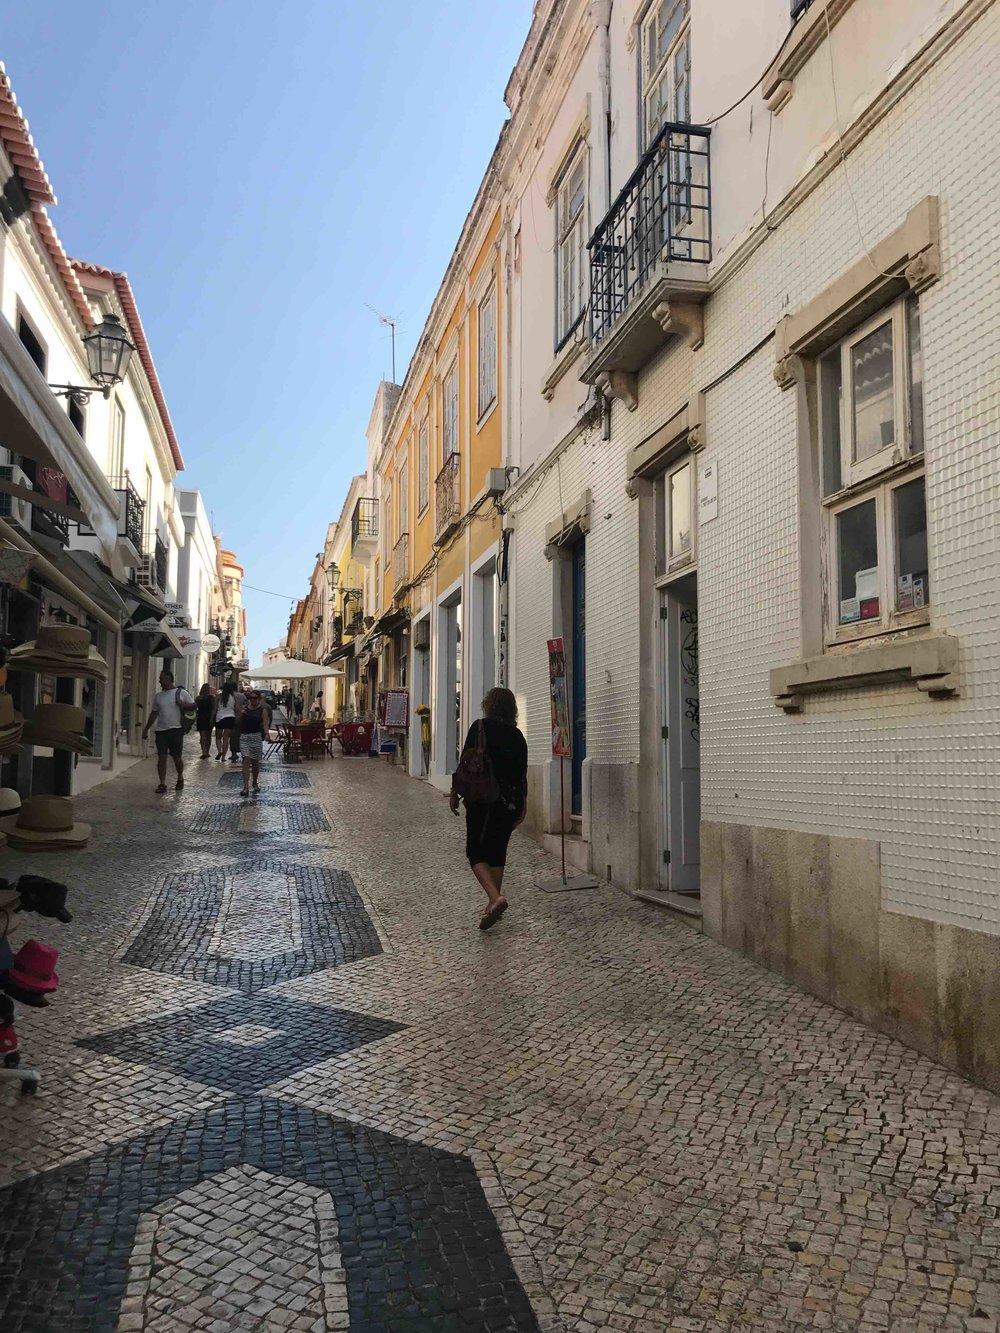 #disawistories #reiseblog #portugal #algarve #lagos #altstadt #surfen.jpg